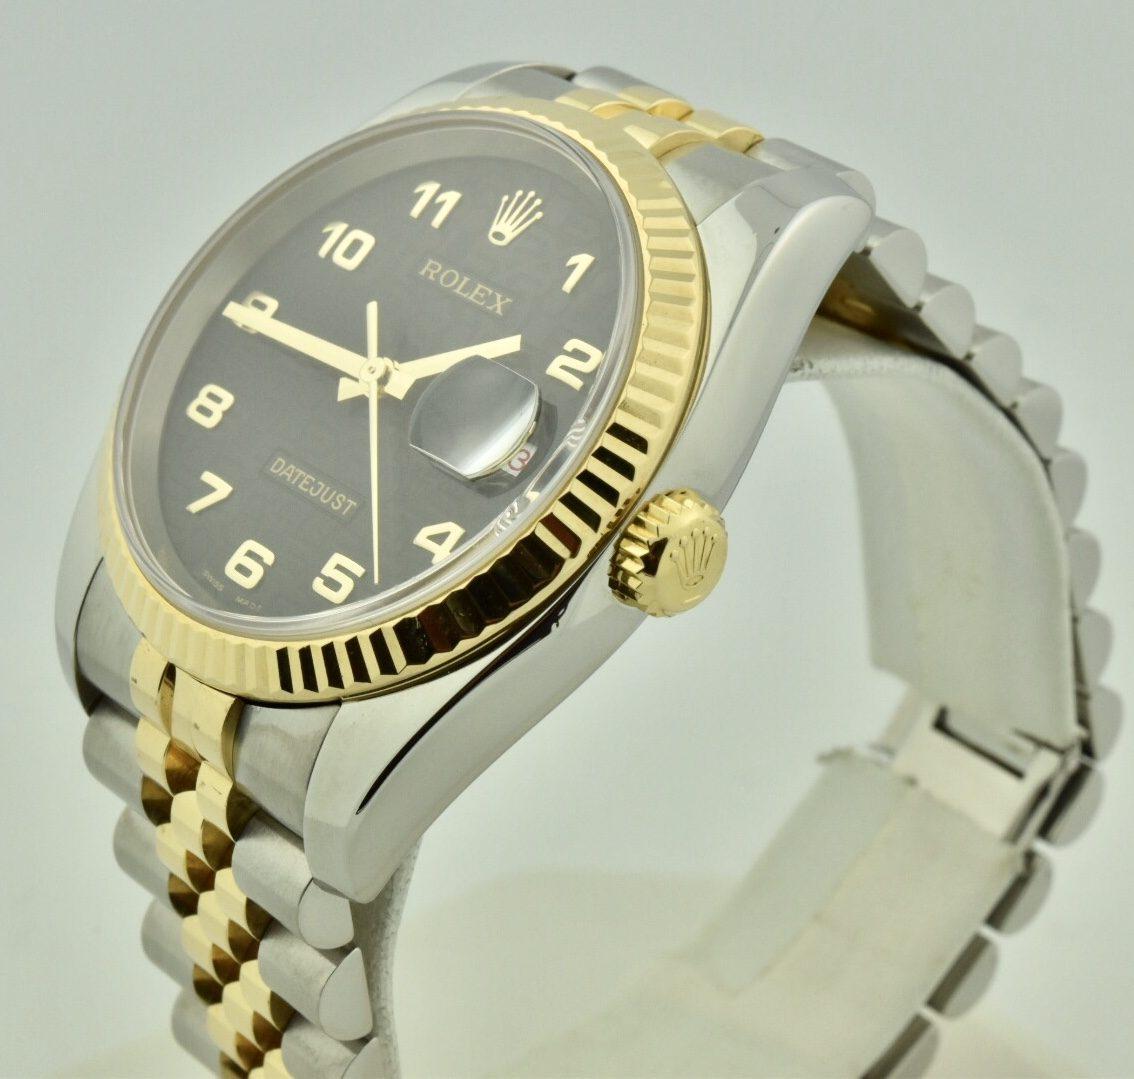 IMG 7980 - Rolex Datejust 36mm